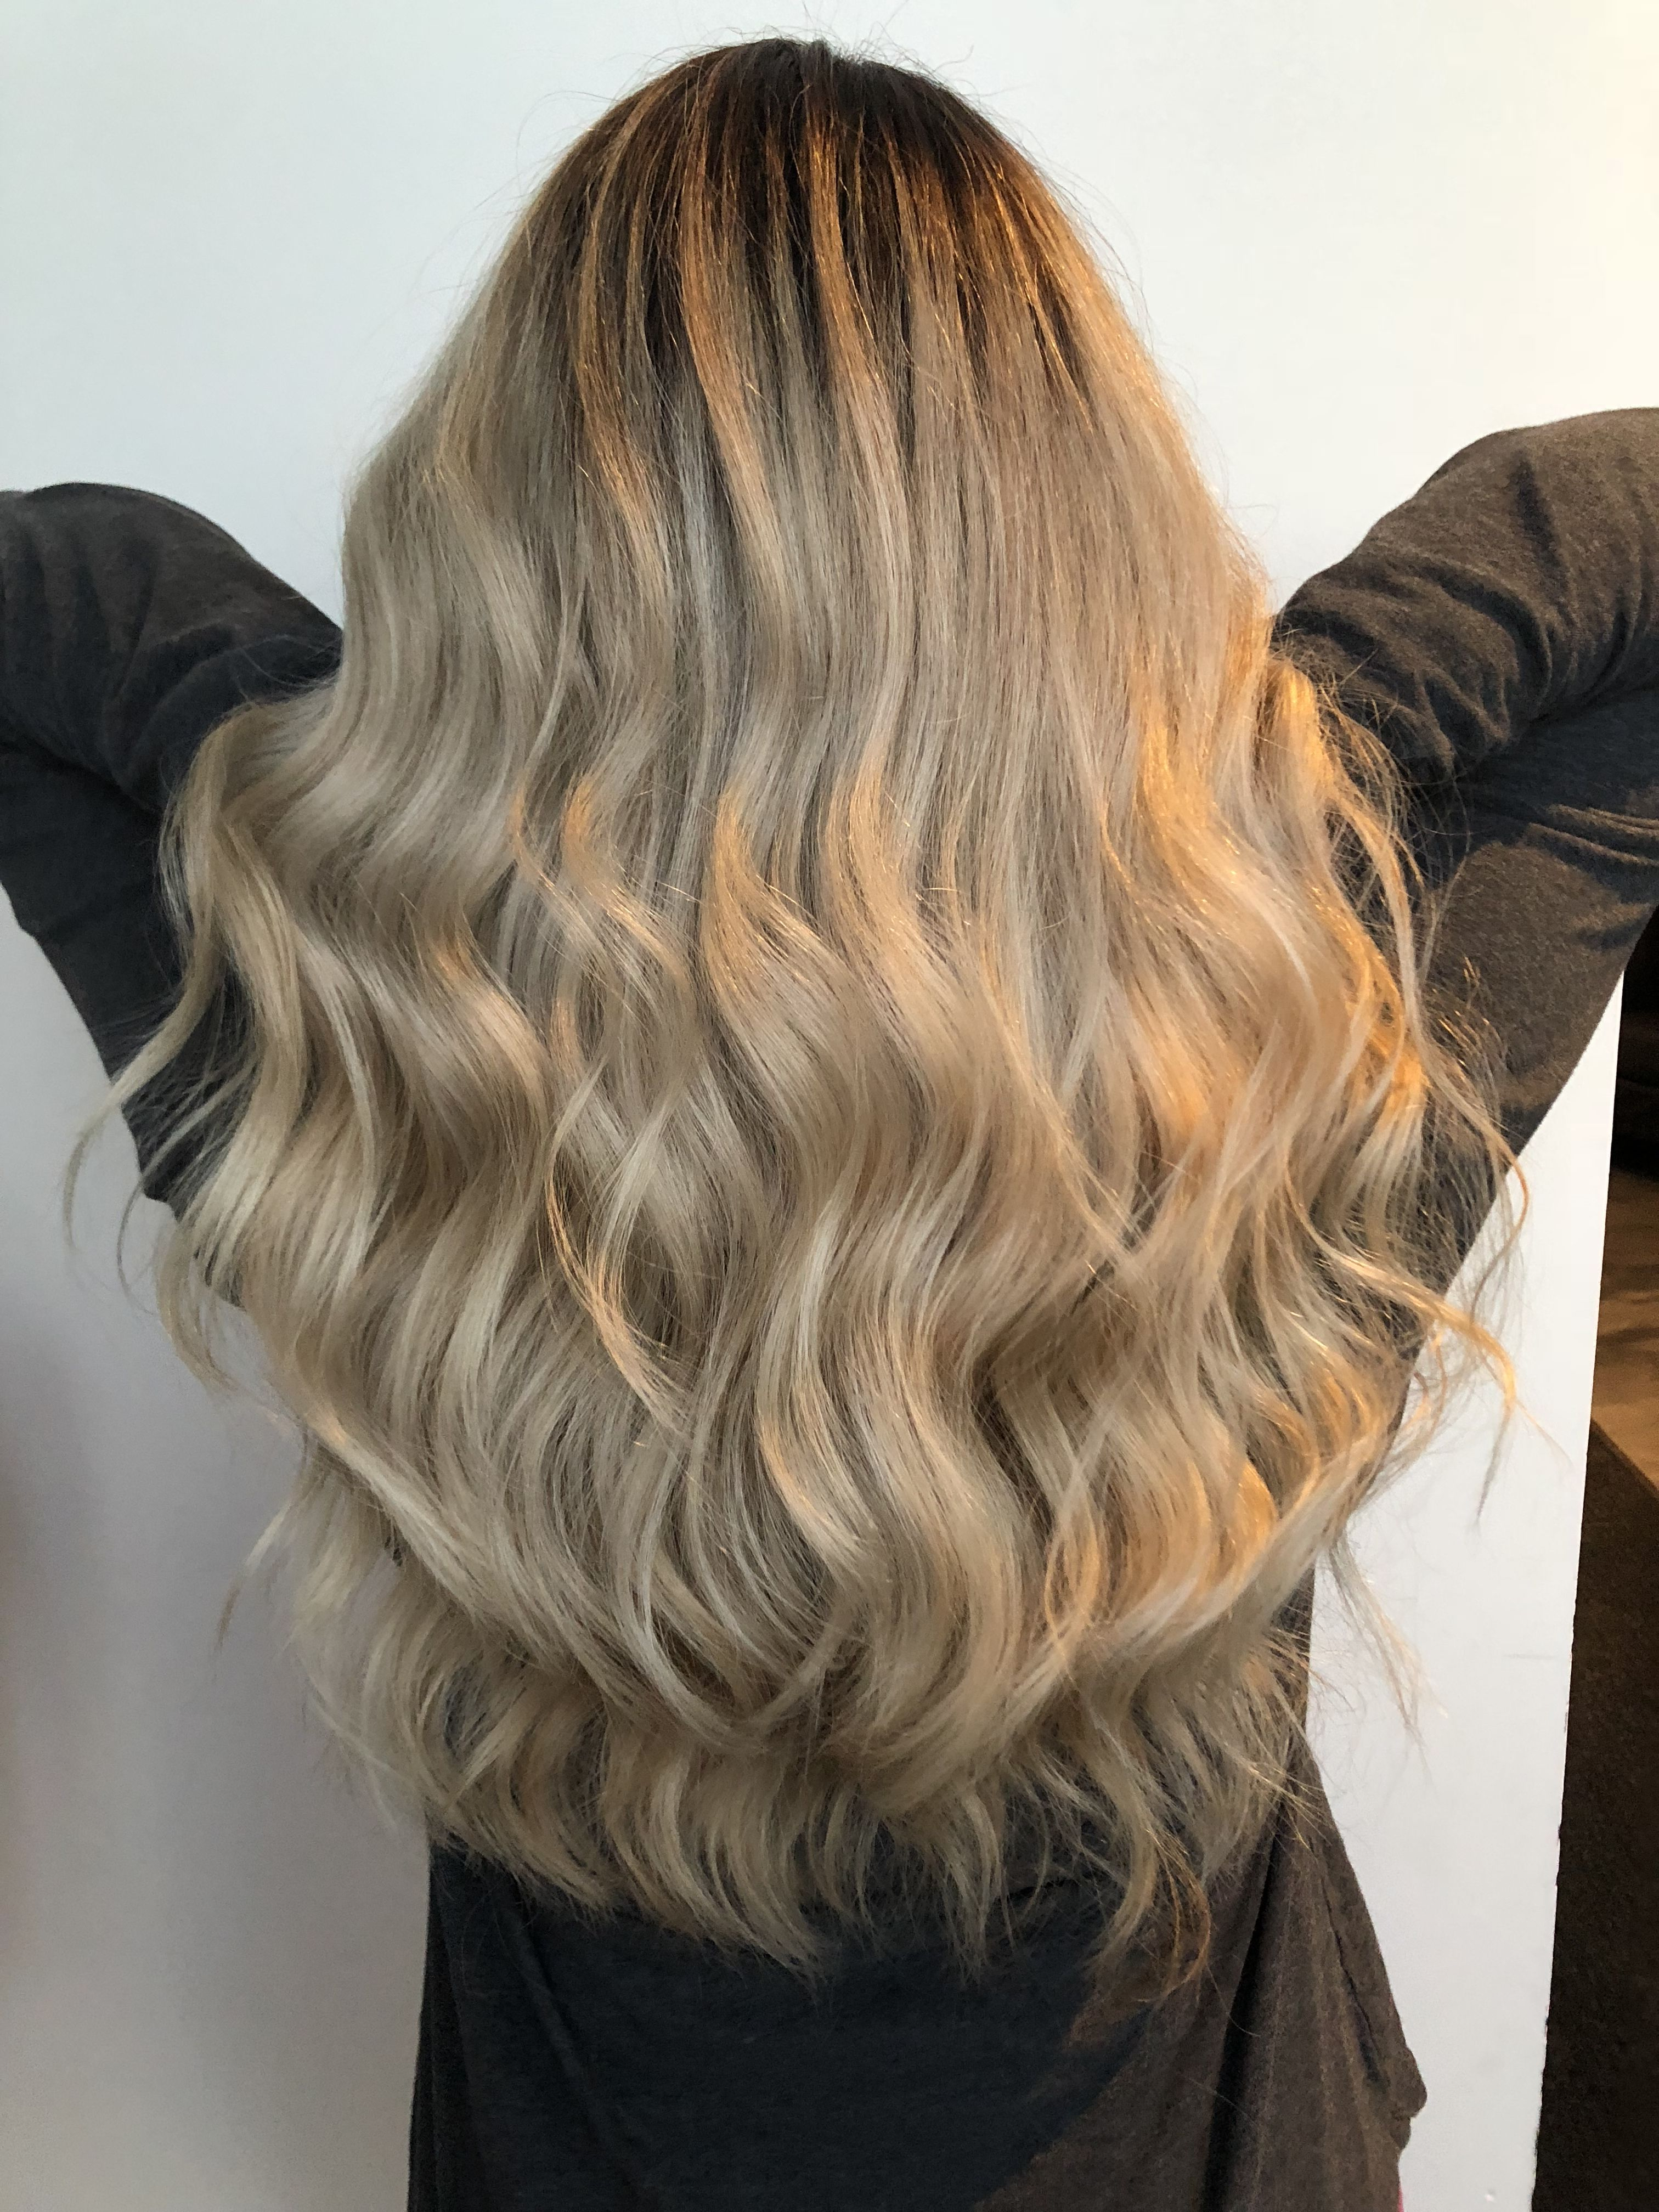 Root Shadow Root Smudge Blonde Hair Long Blonde Hair Blonde Women Balayage Color Rooted Blonde Lkhairstudios Hair Stylist Hair Long Hair Styles